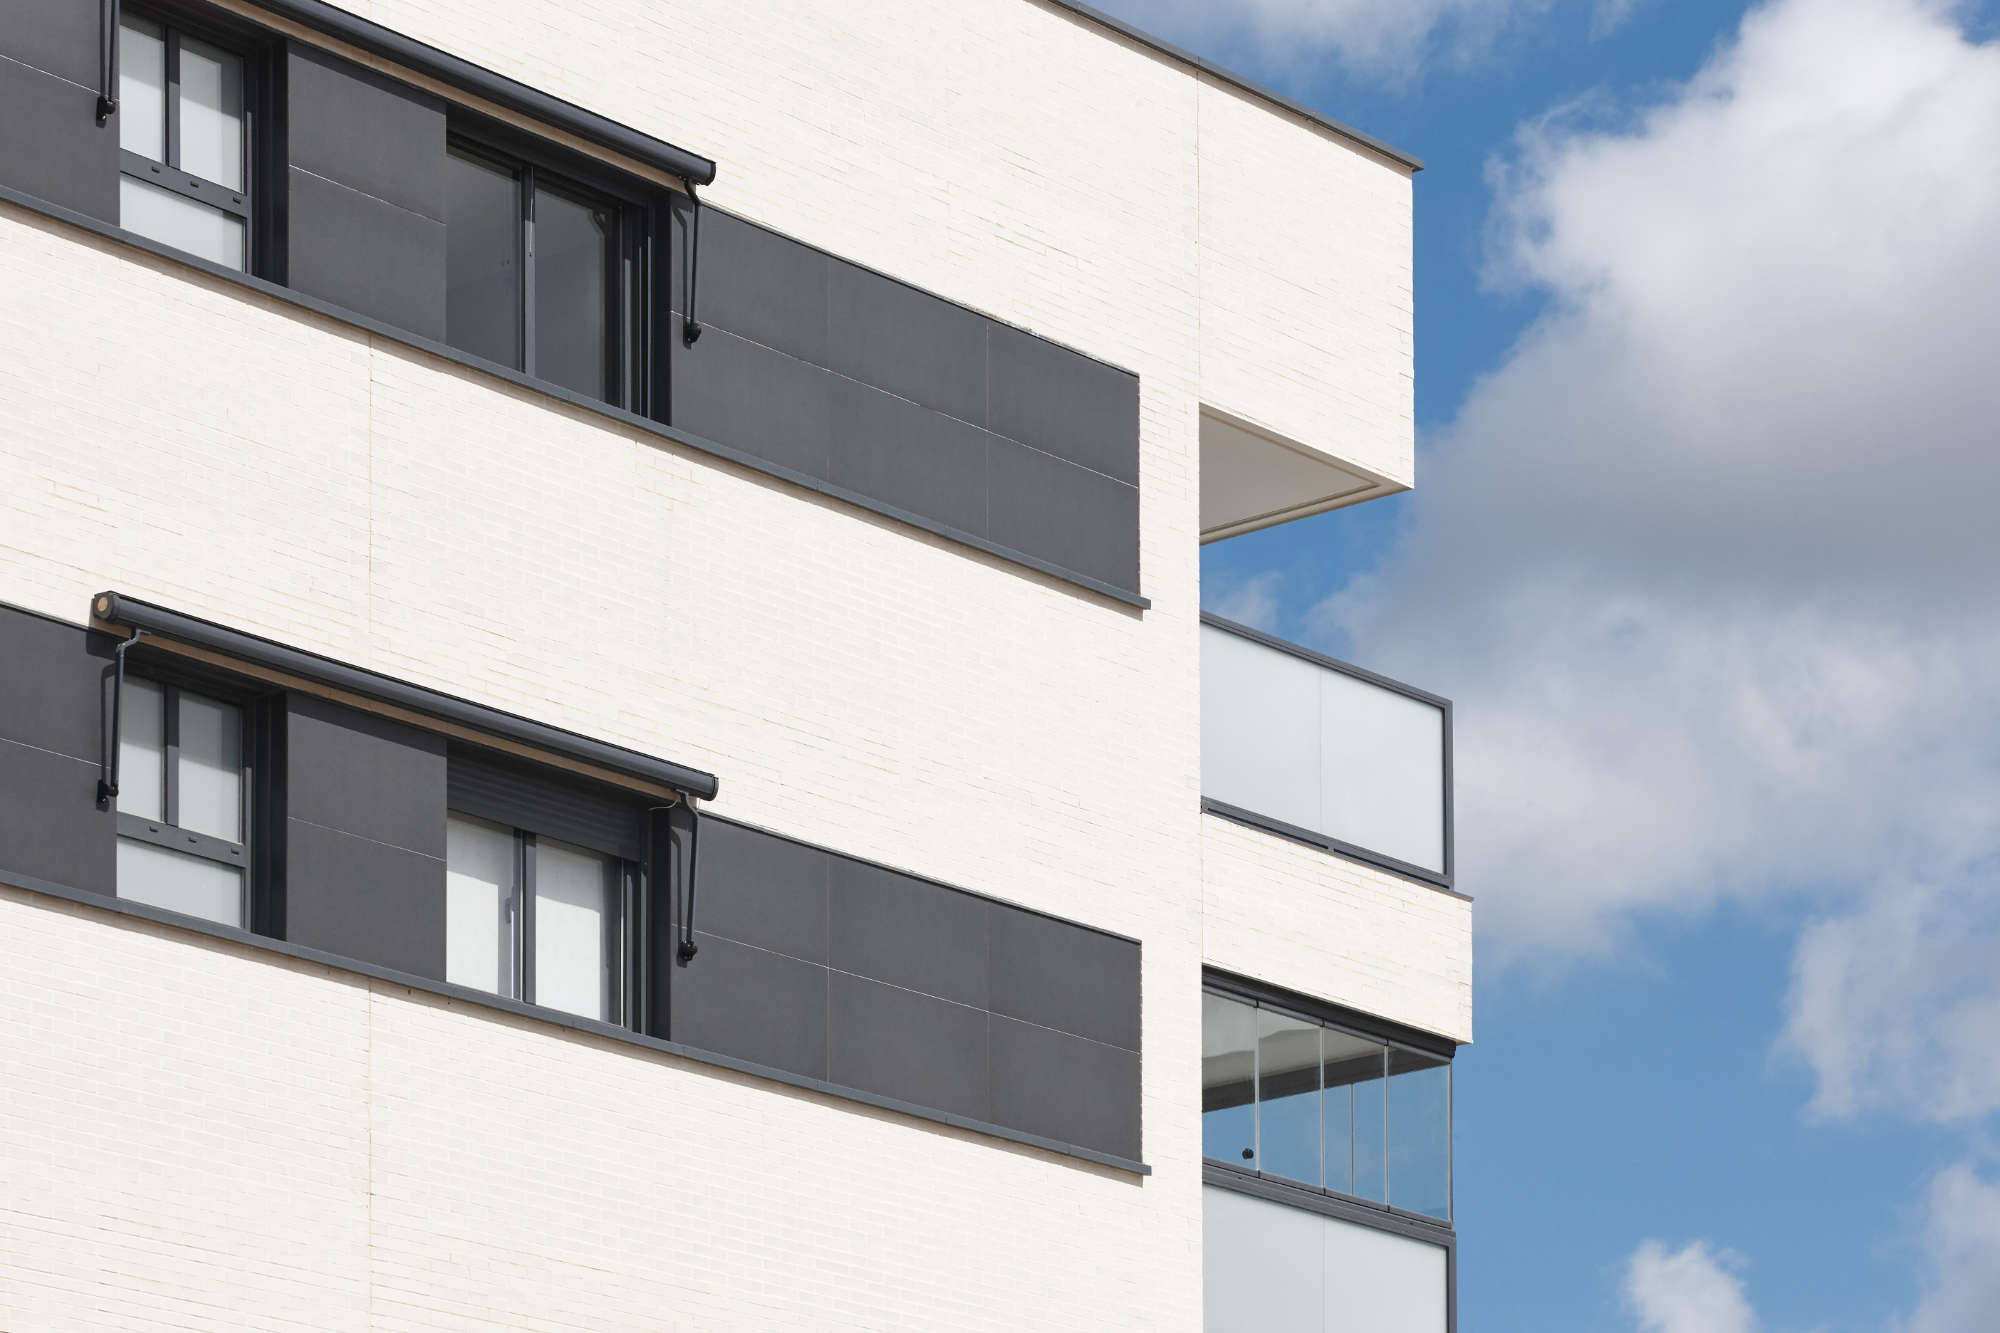 new-building-exterior-facade-with-terrace-construc-2ZYN4DS.jpg